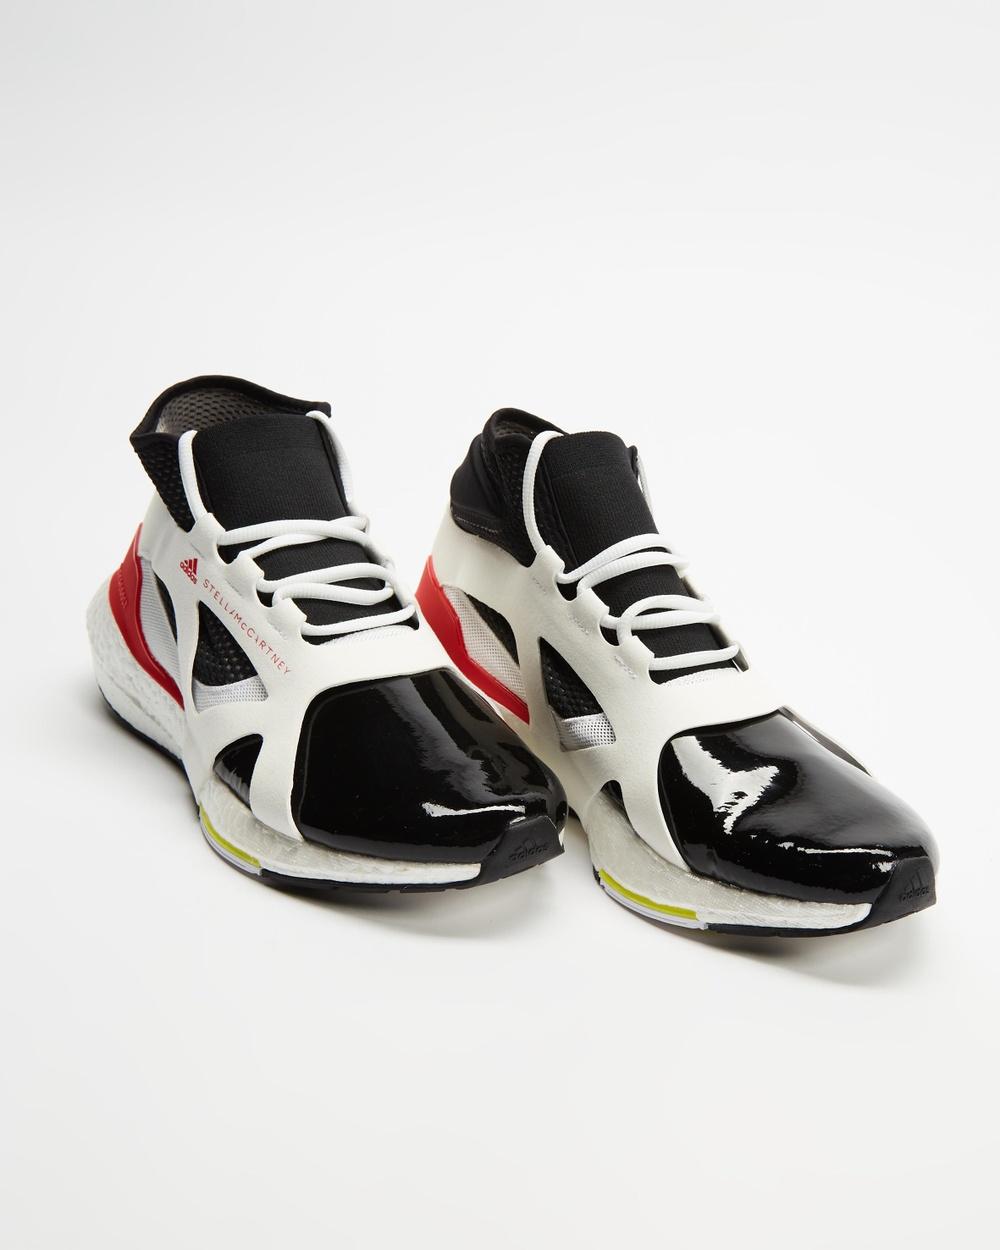 adidas by Stella McCartney Ultraboost 21 Women's Performance Shoes White, Core Black & Vivid Red